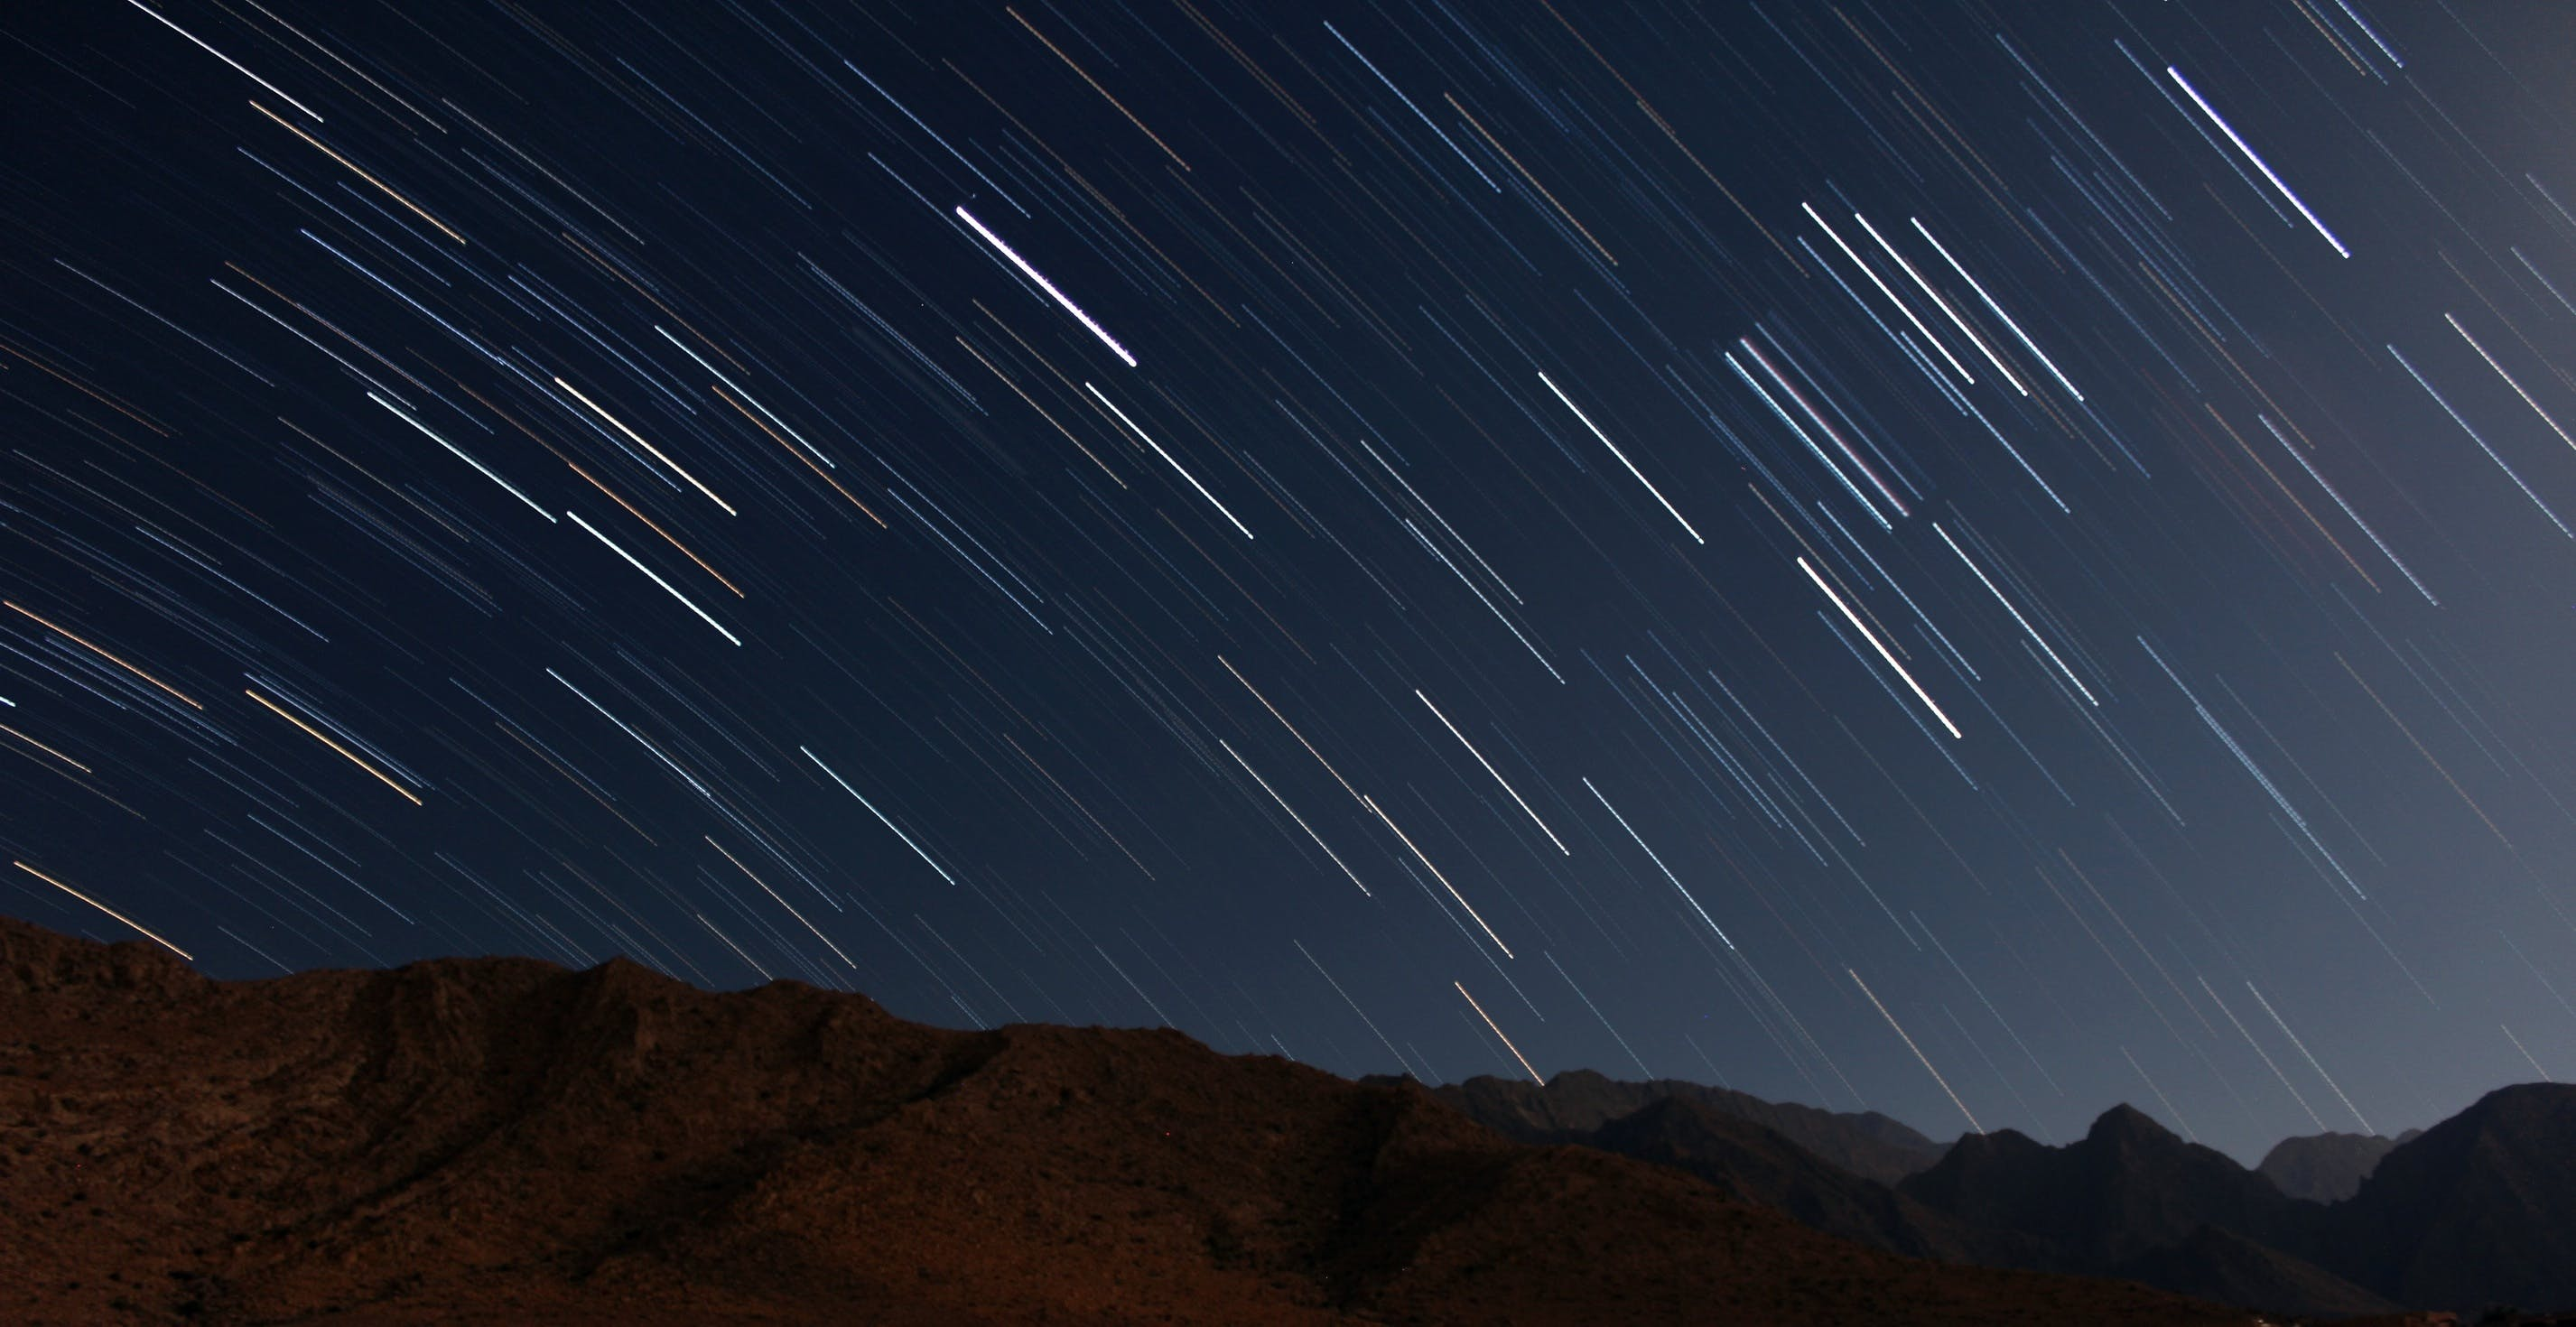 Free stock photo of nature, sky, night, water